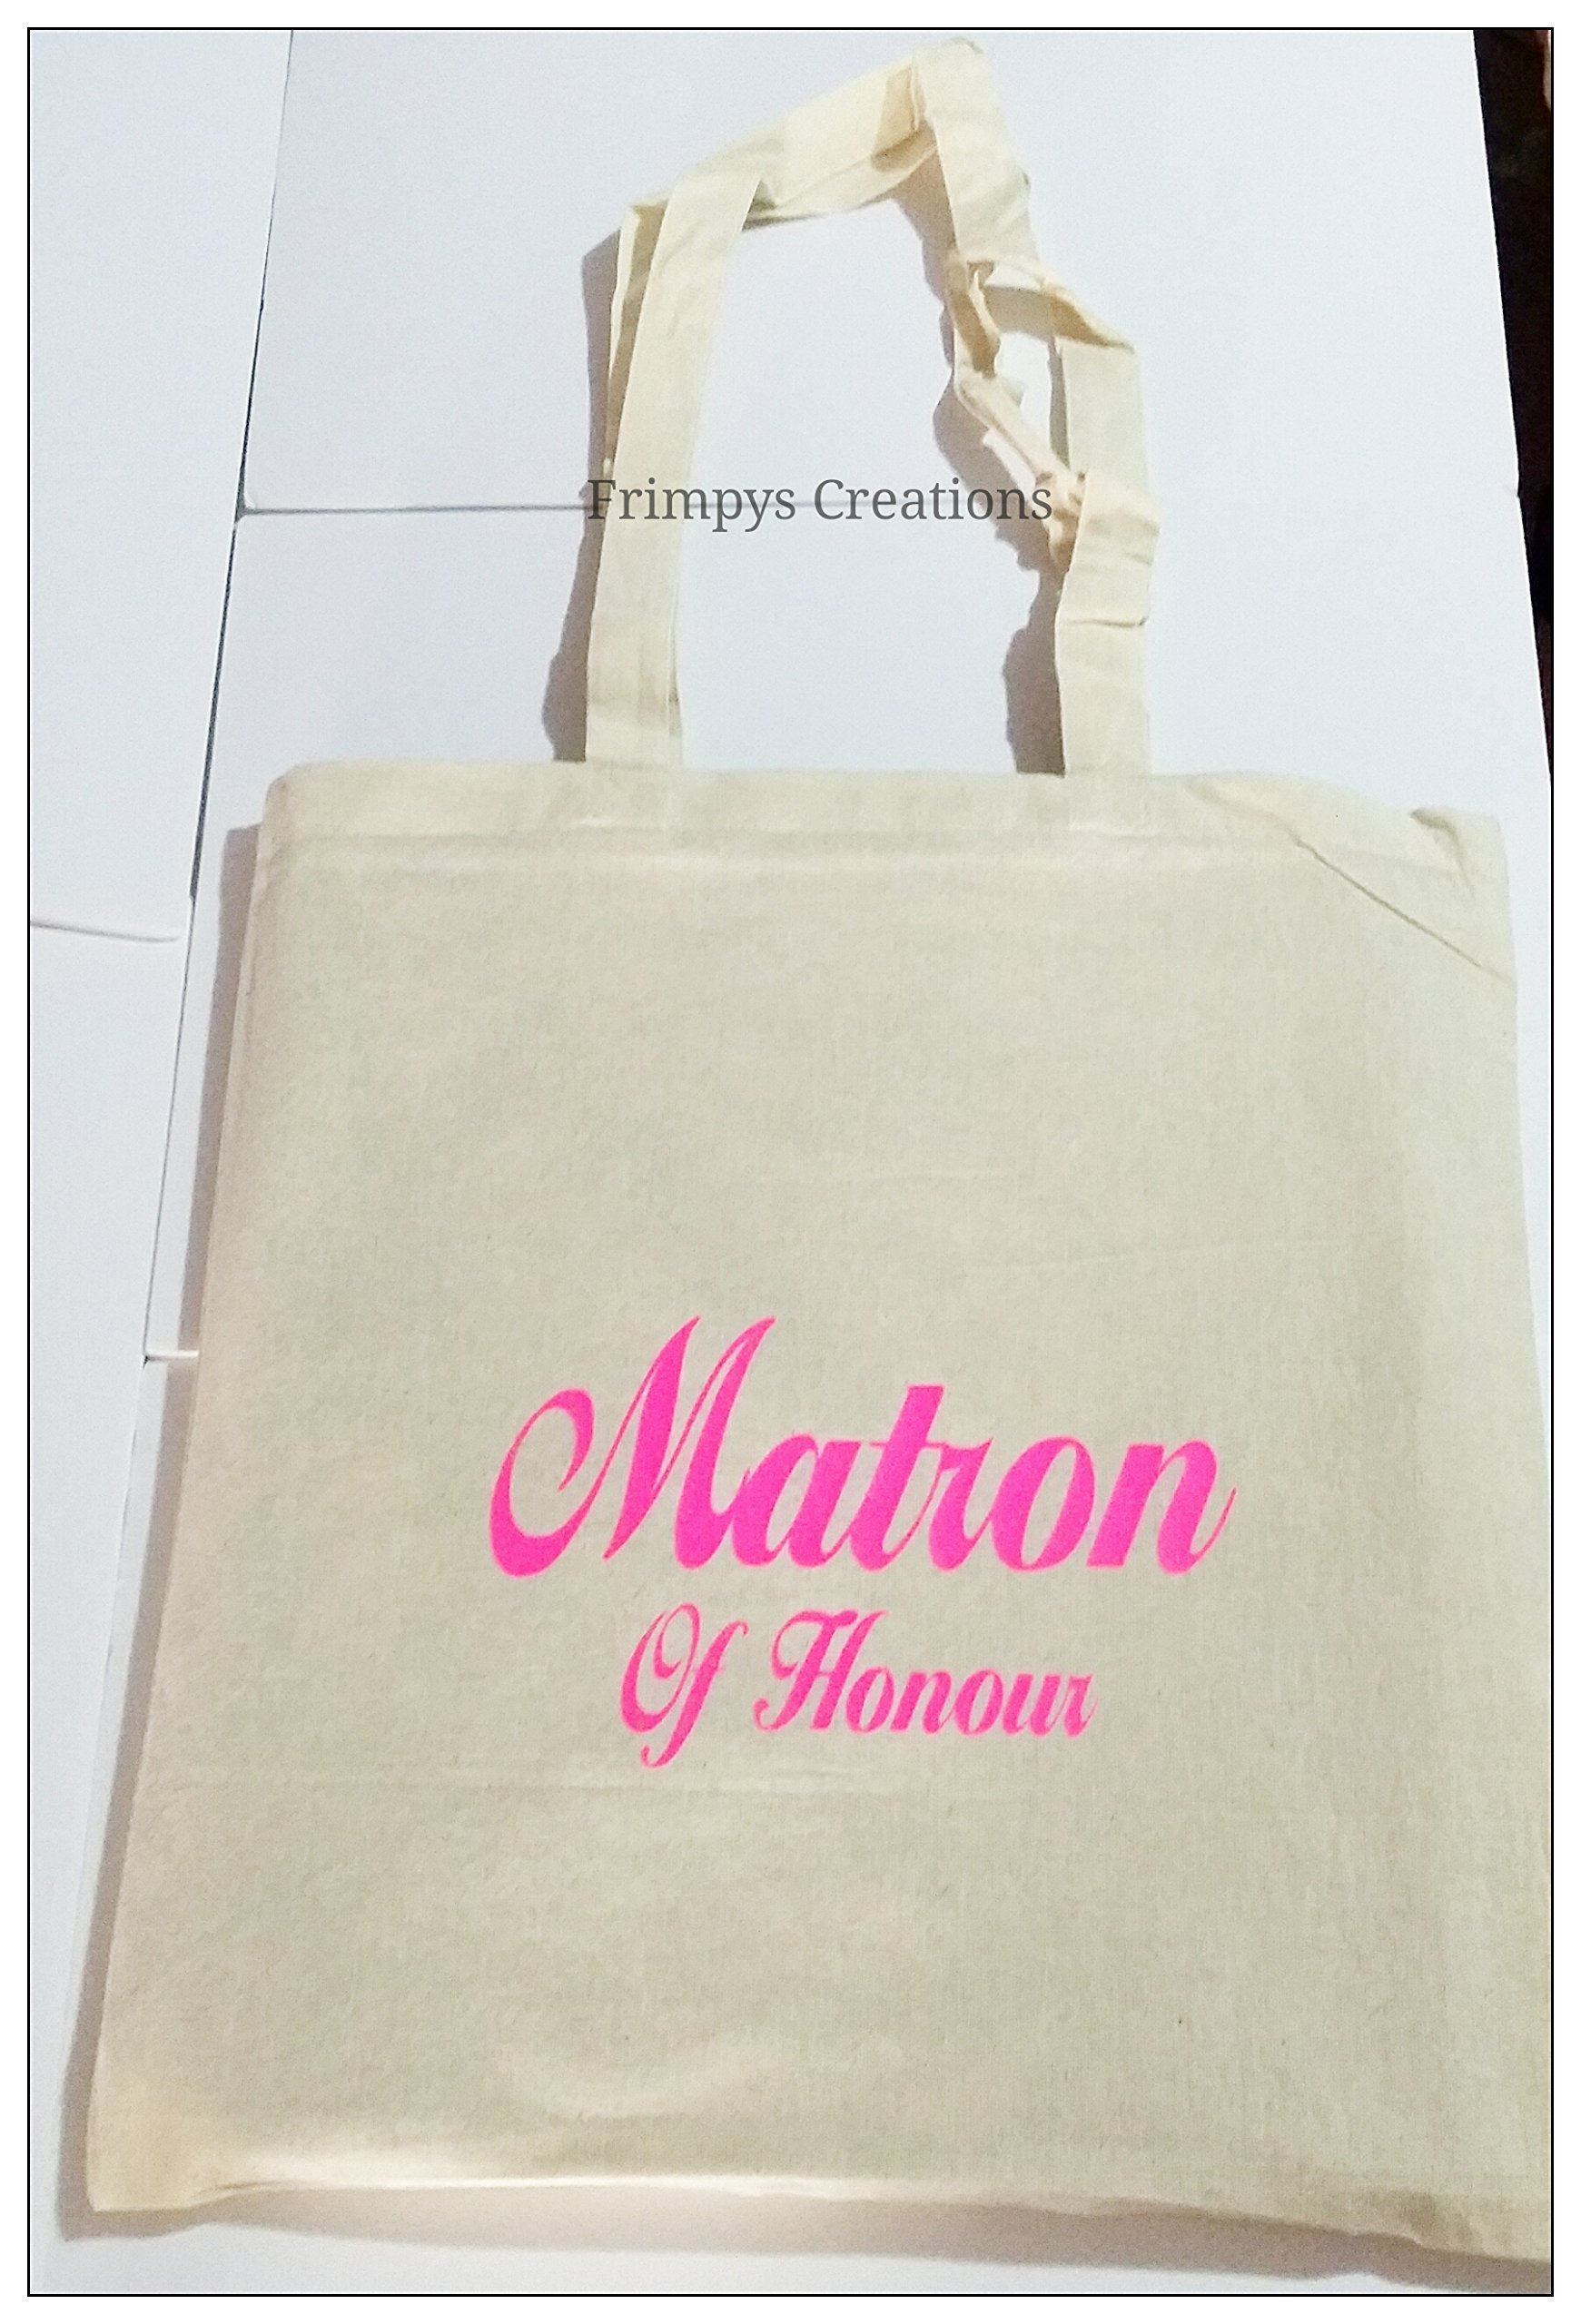 Wedding Favour Tote Bag cotton Printed Gift Present Keep Matron Of Honour Novelty (BAG) - handmade-bags